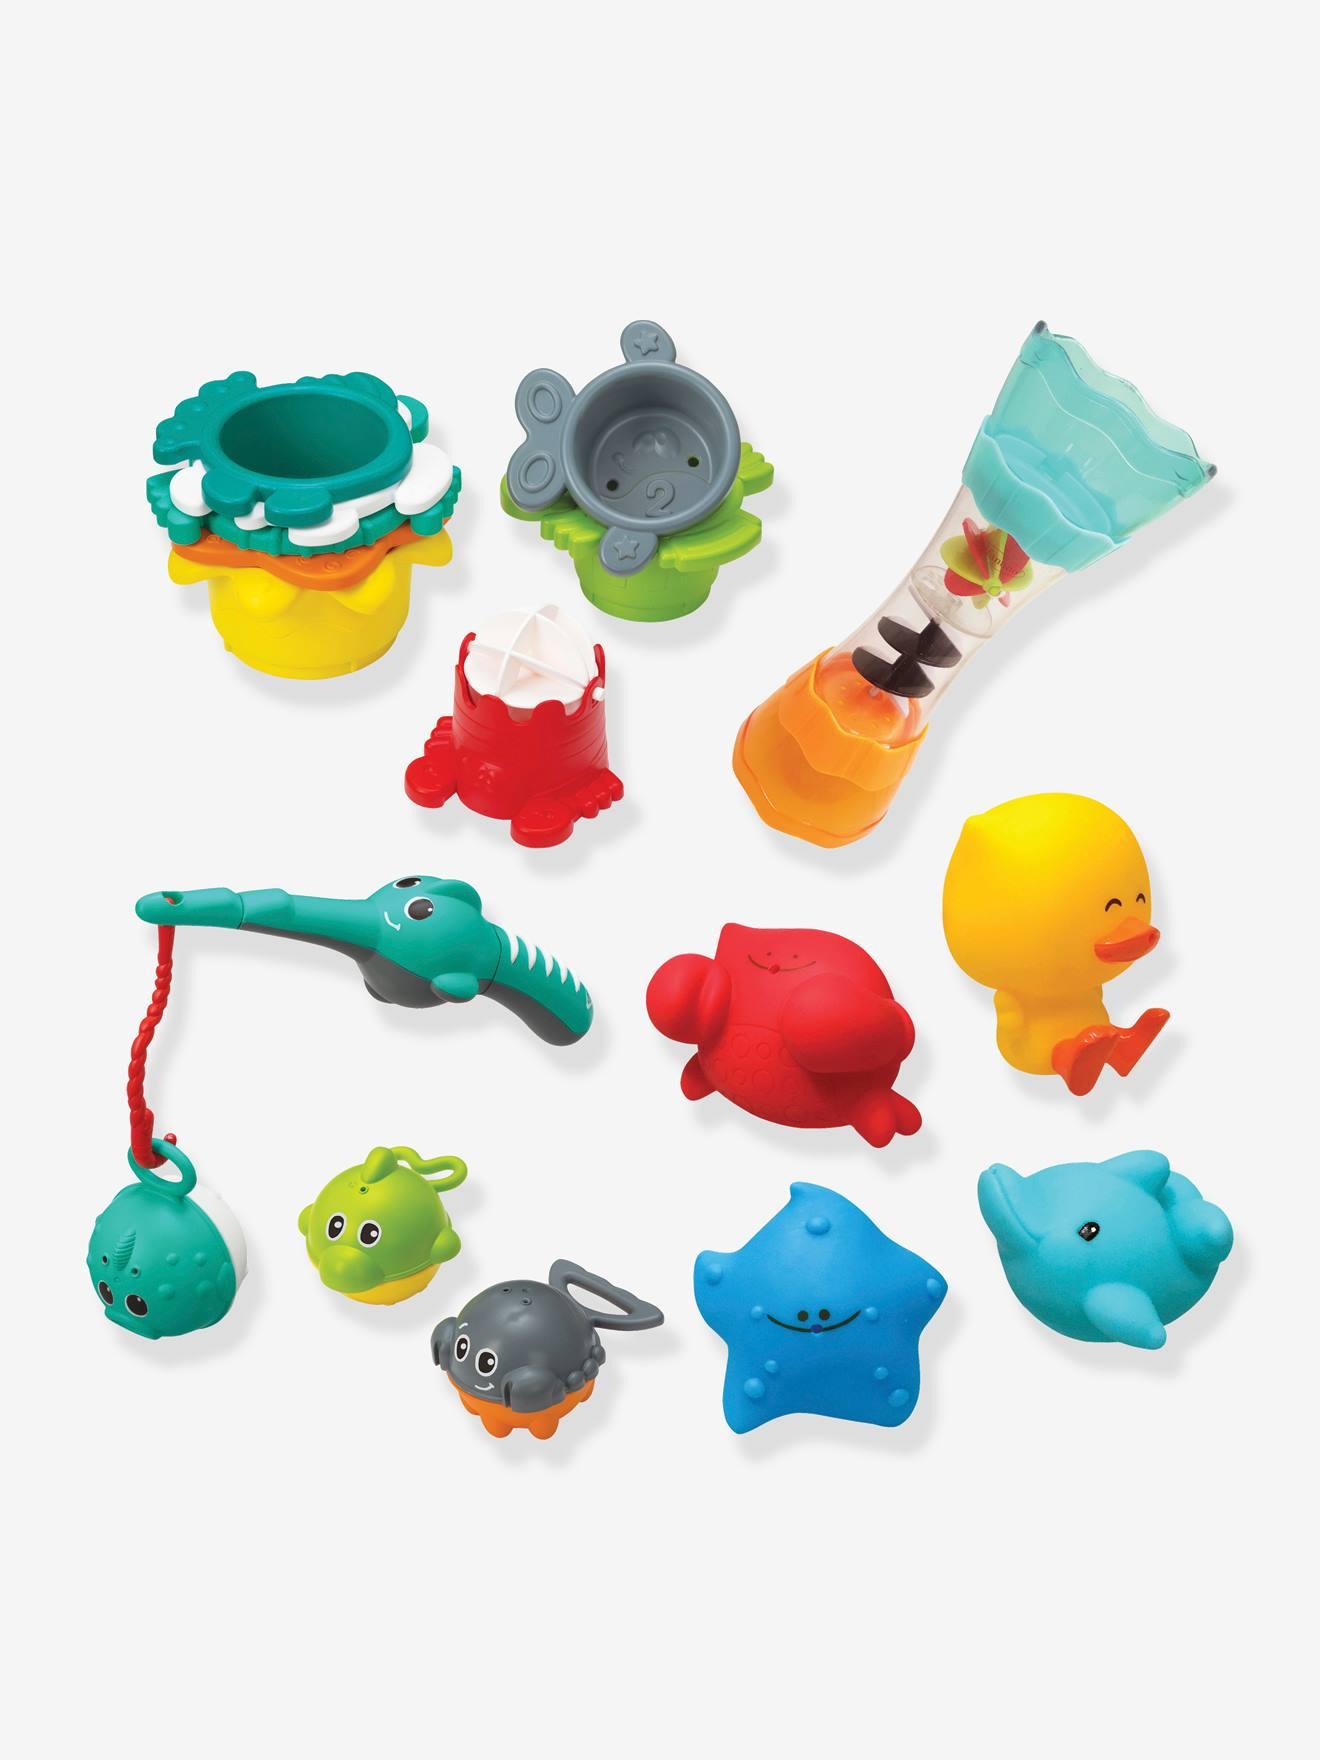 INFANTINO Estuche de baño con 17 piezas INFANTINO azul medio liso